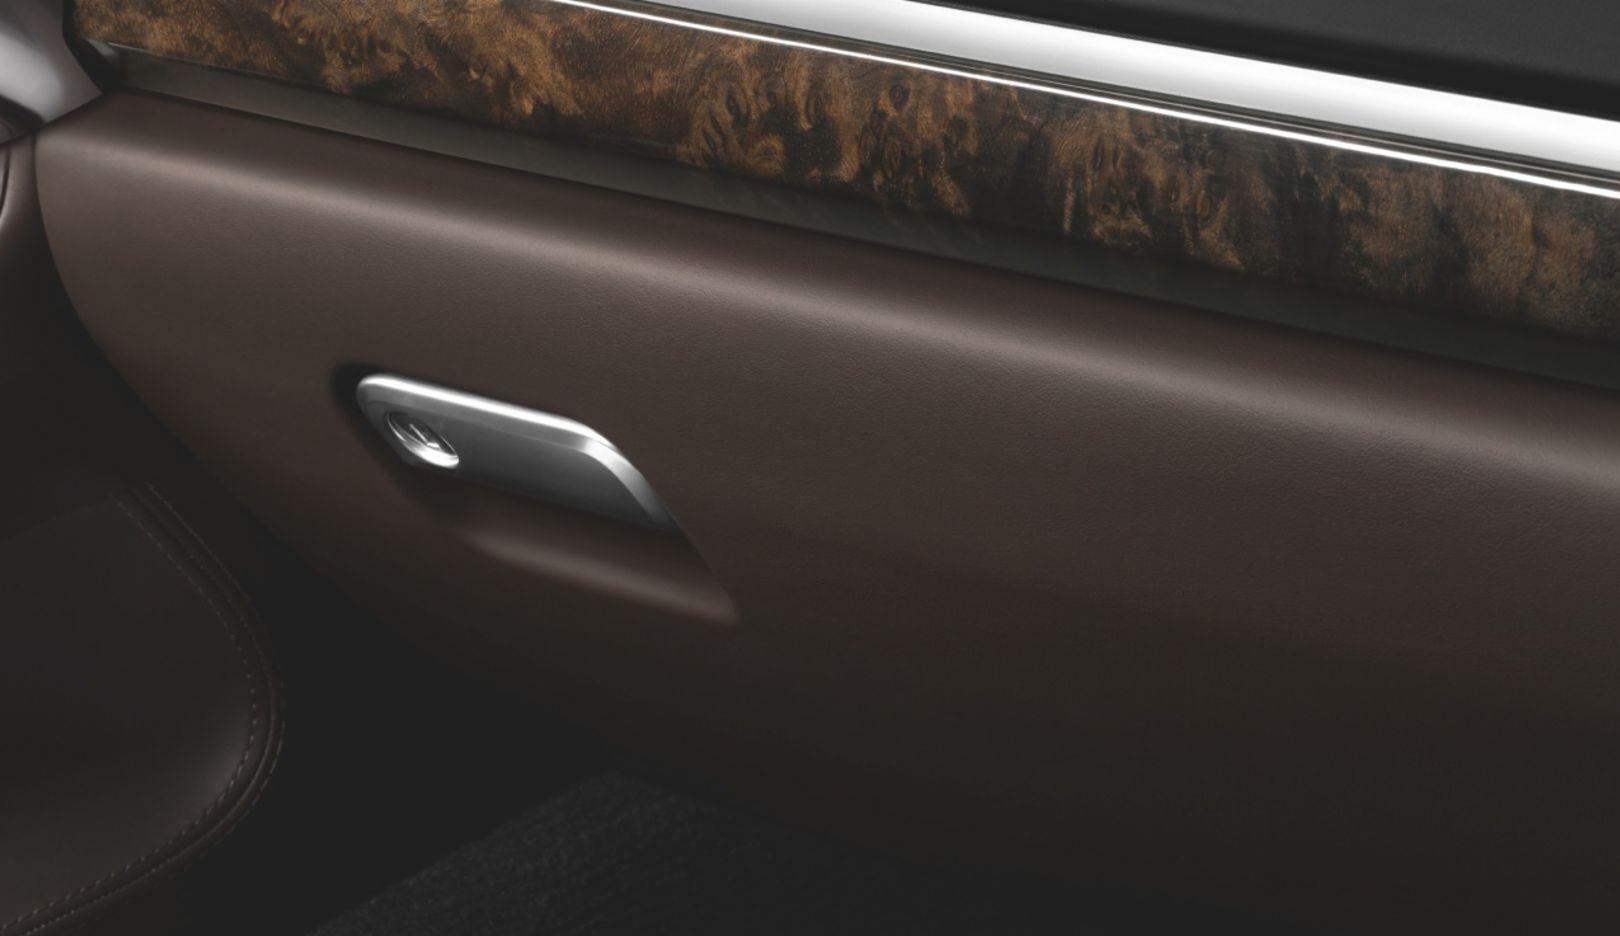 Cayenne Turbo, Detailaufnahme, 2015, Porsche AG